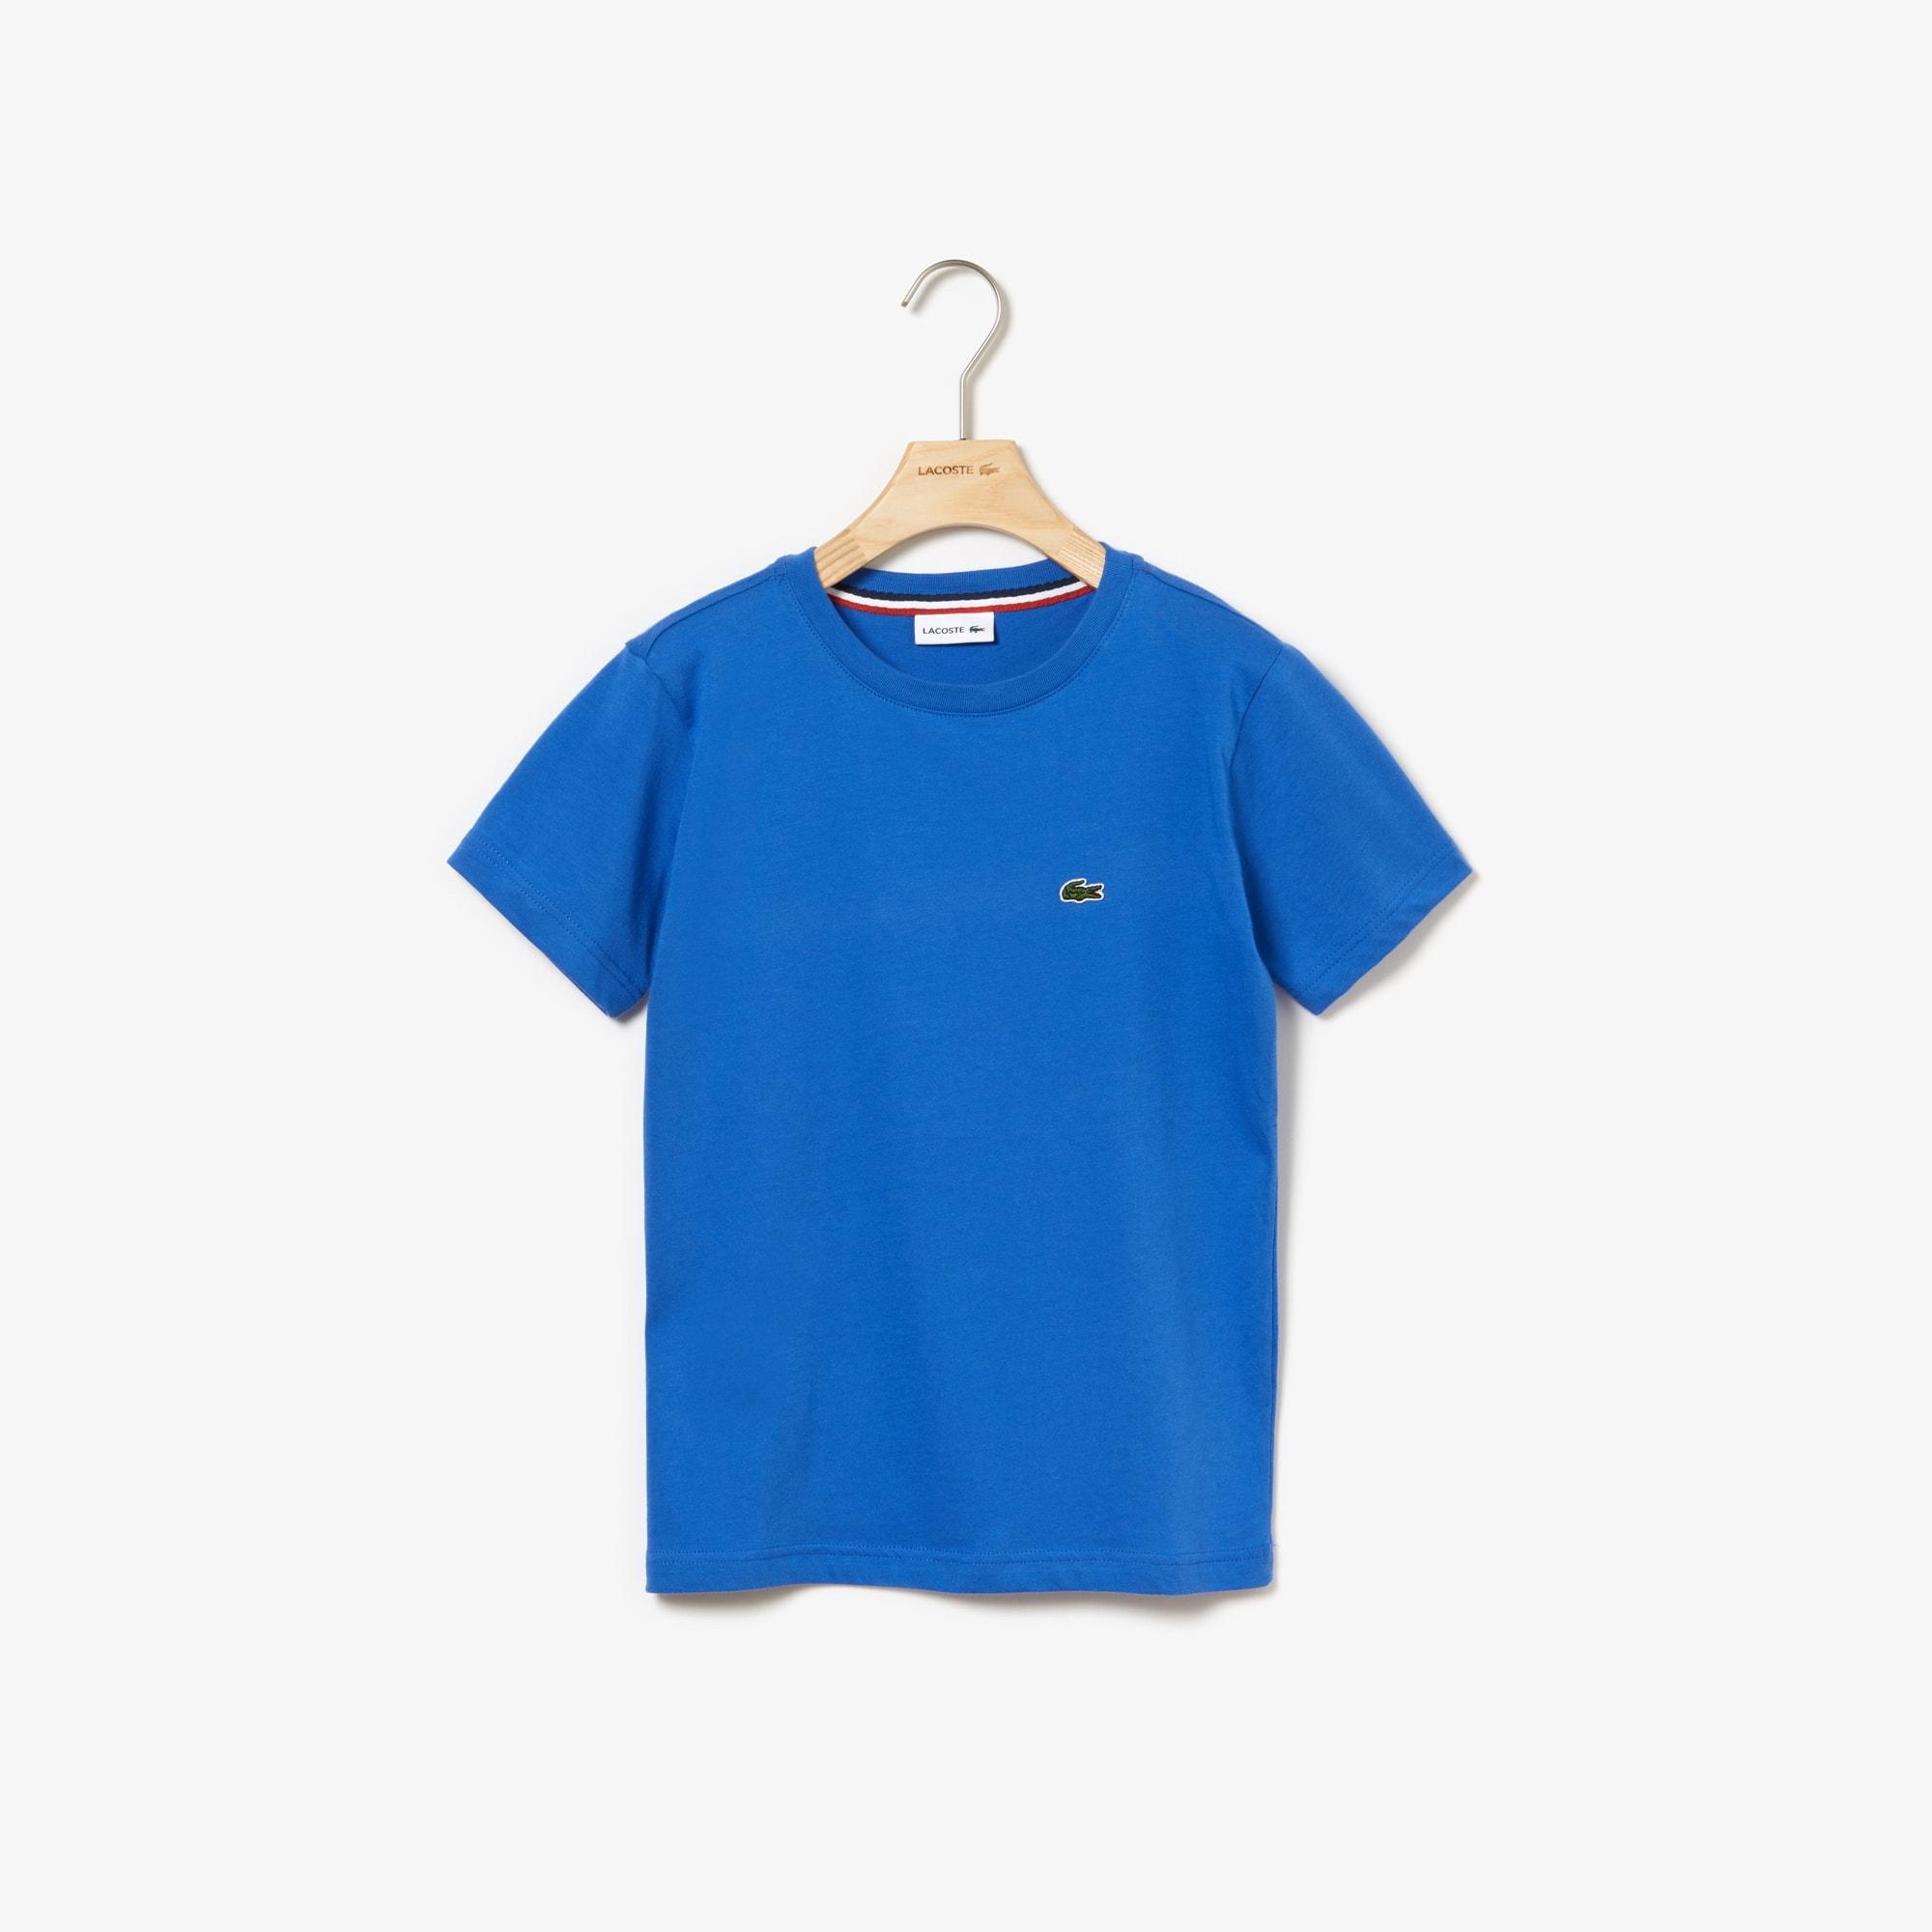 23e4e88e Boy's T-shirts, Coats and Jumpers | Kids Fashion | LACOSTE